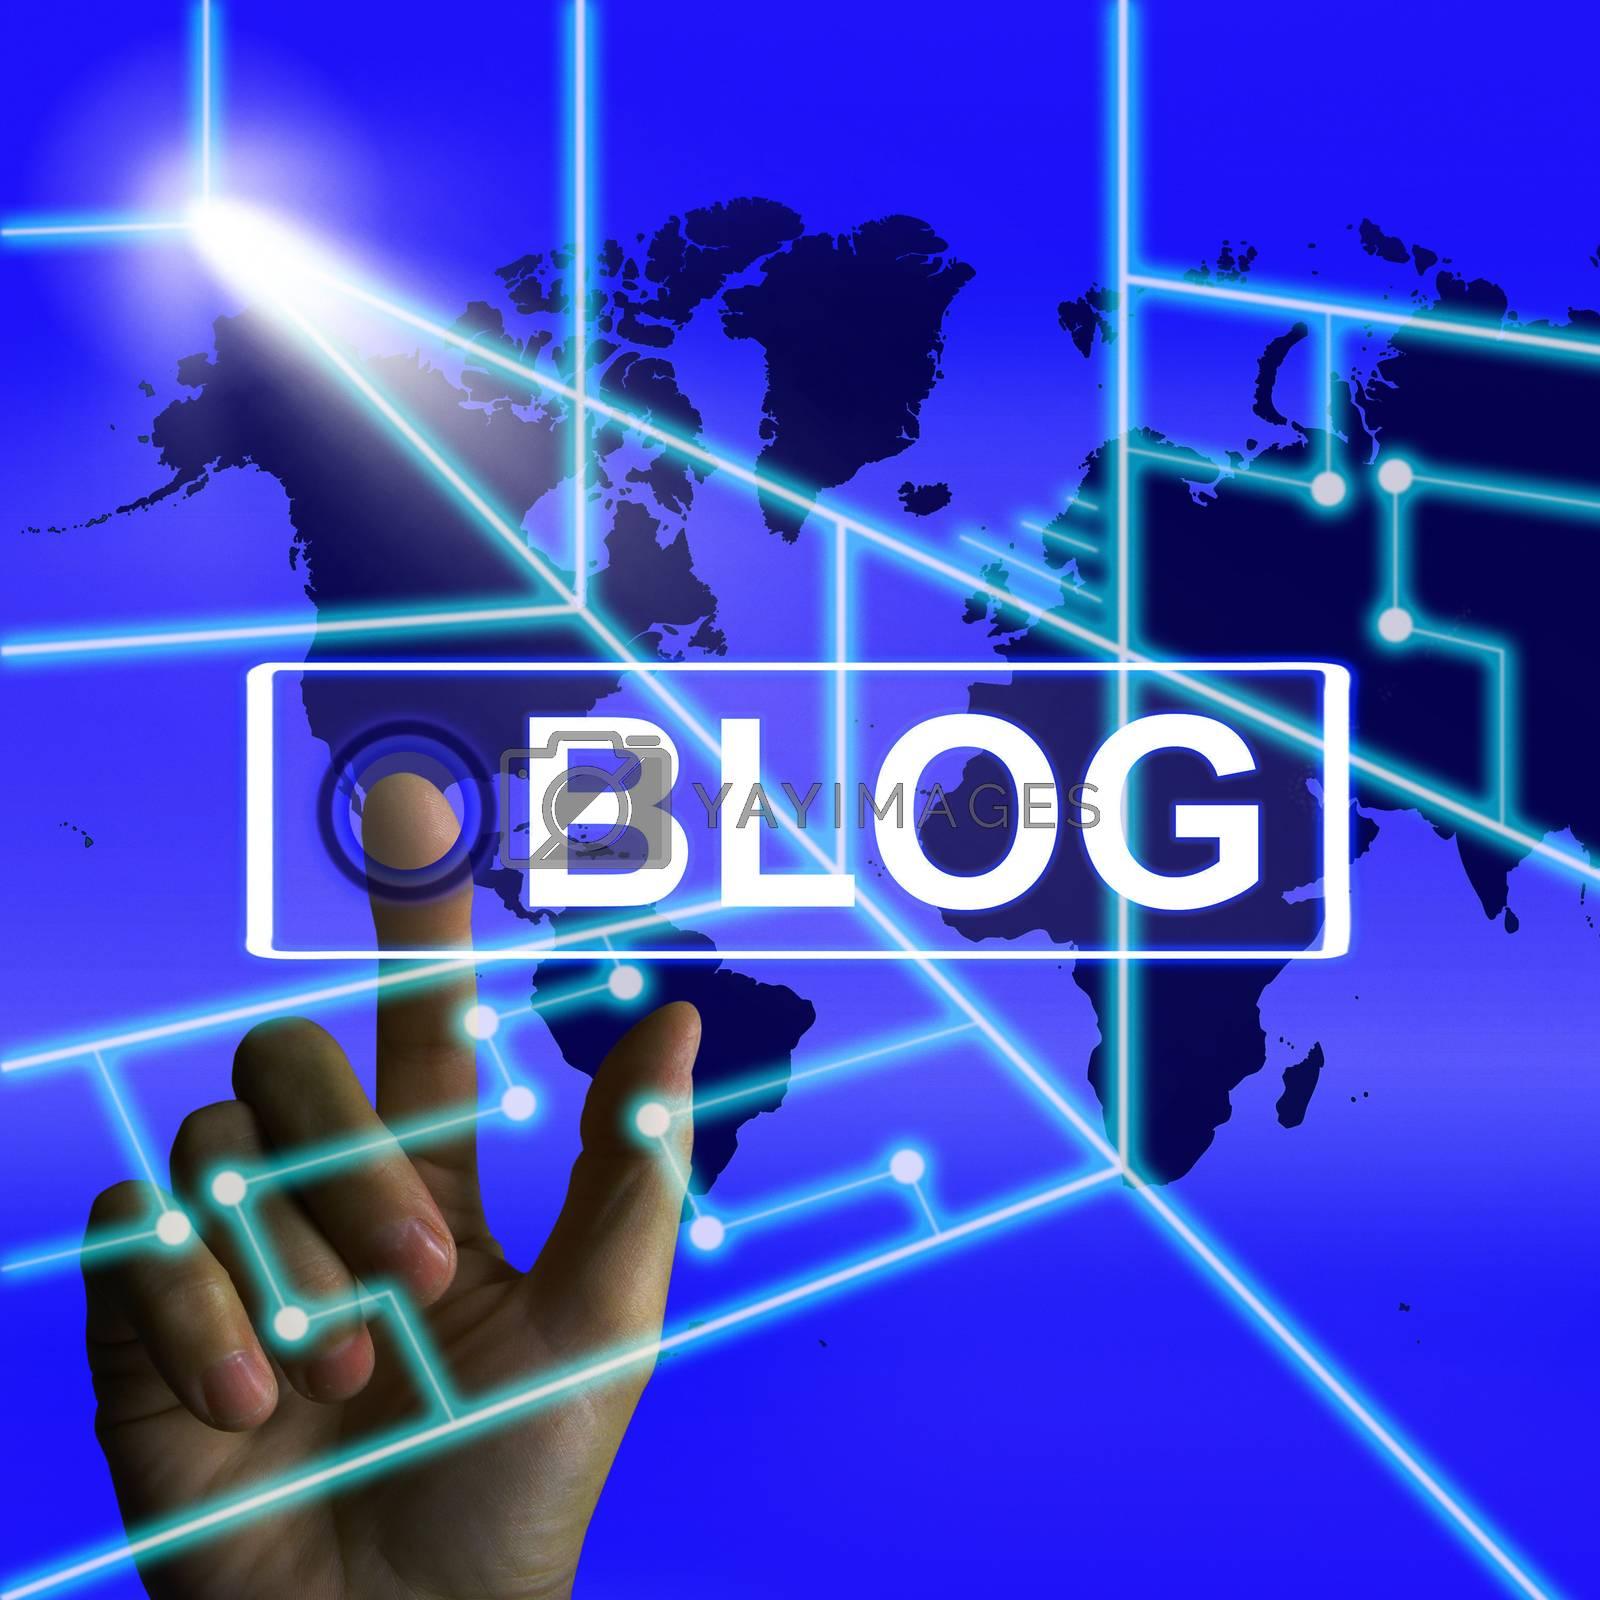 Blog Screen Shows International or Worldwide Blogging by stuartmiles